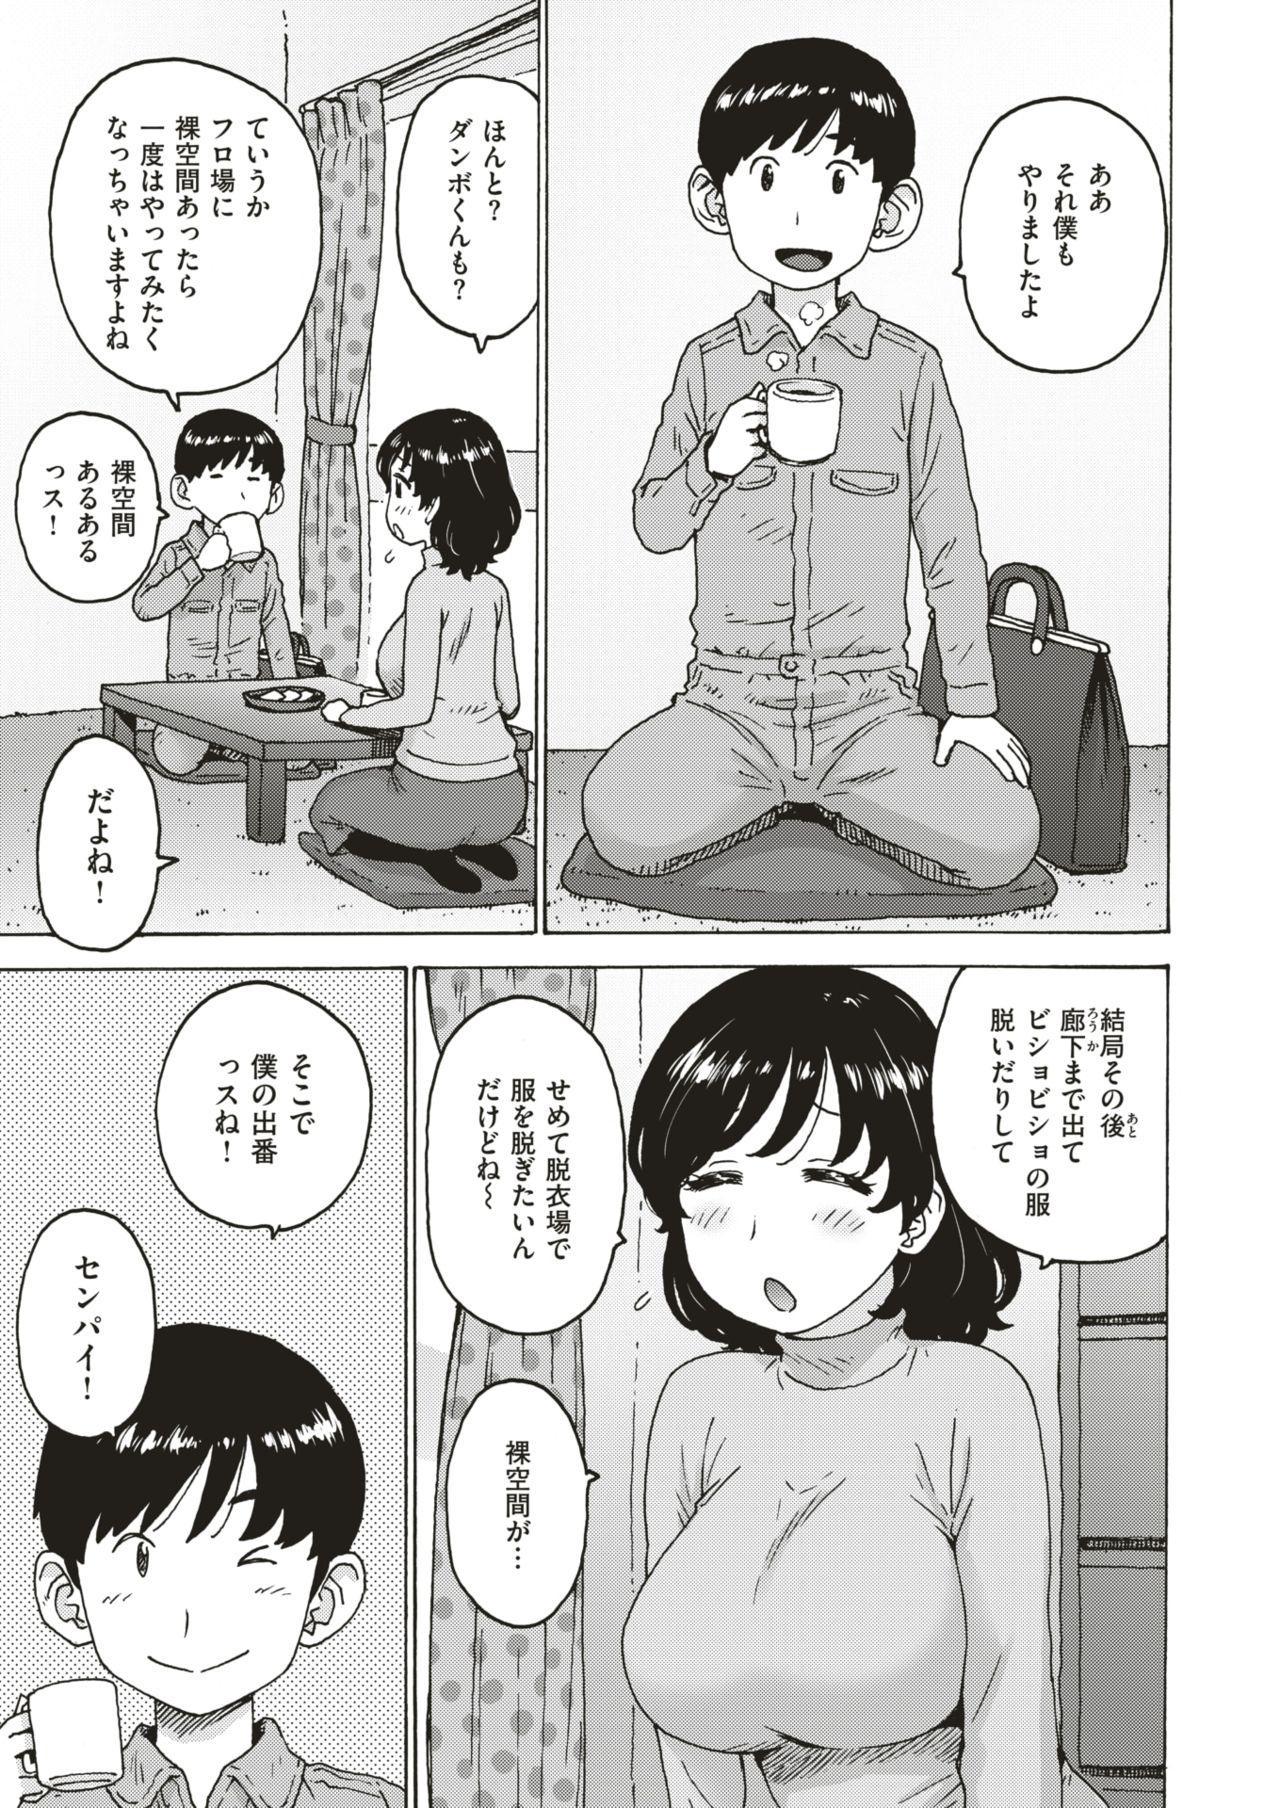 COMIC HAPPINING Vol. 4 37